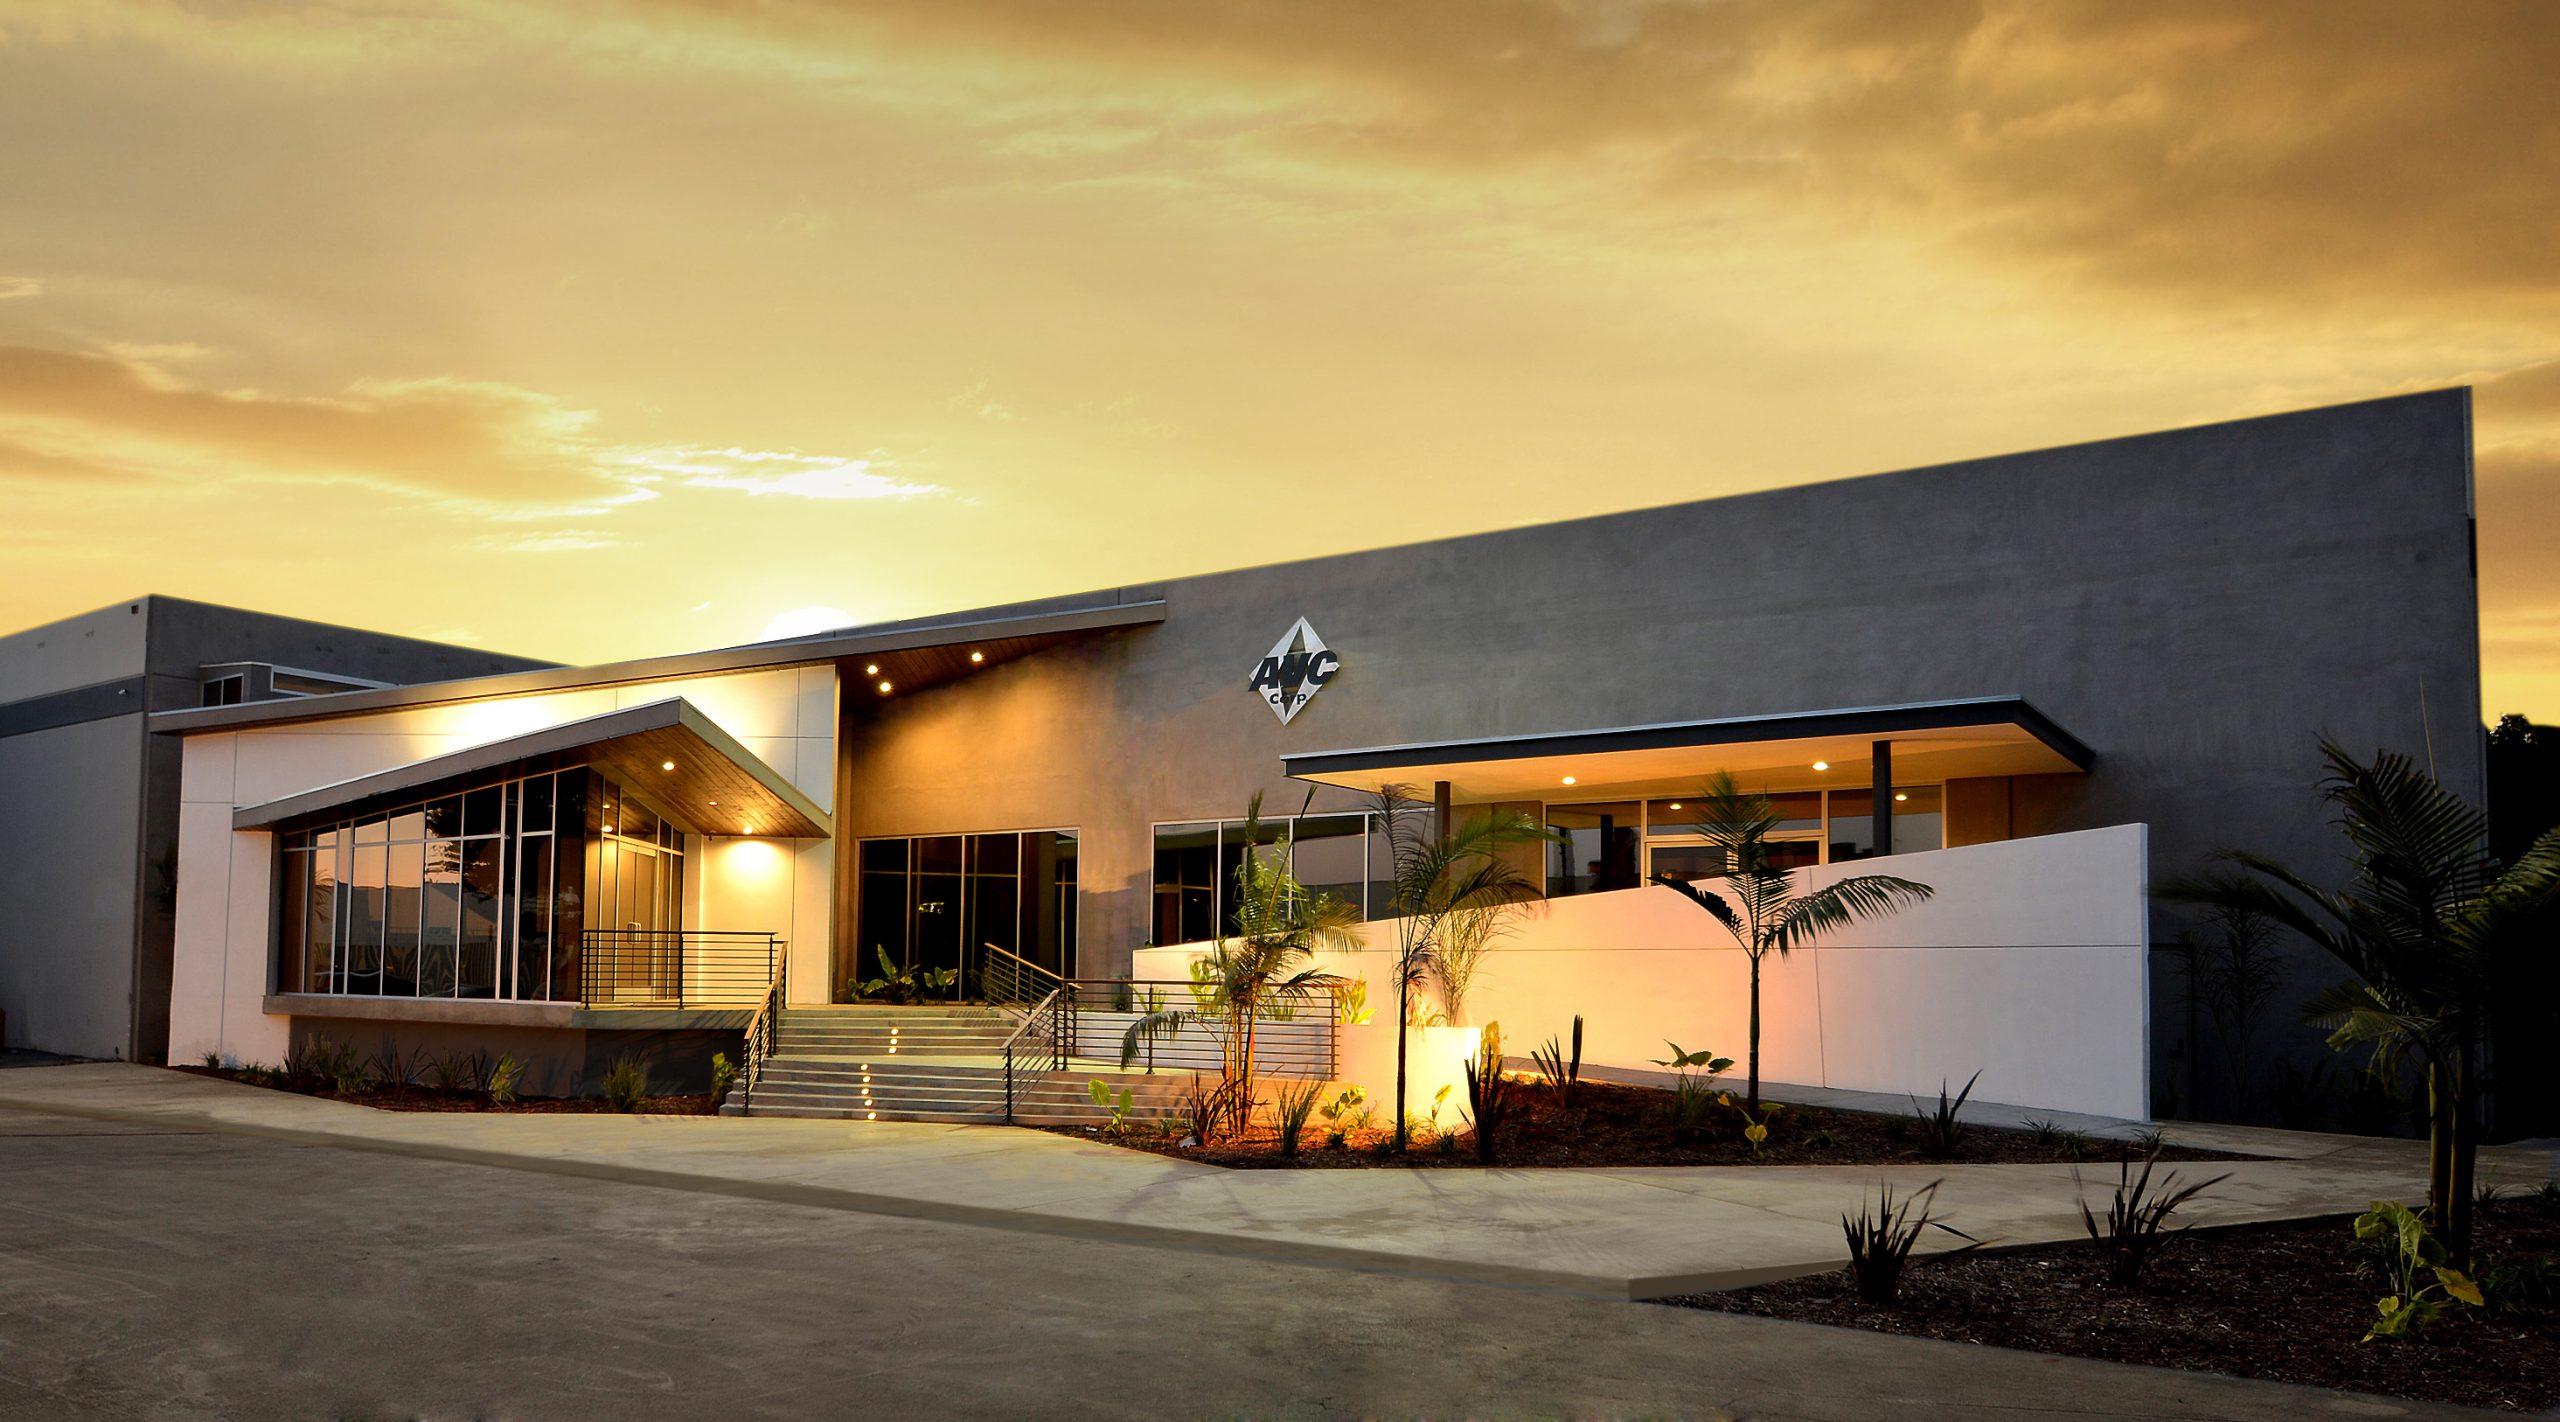 AVC Corporate Headquarters